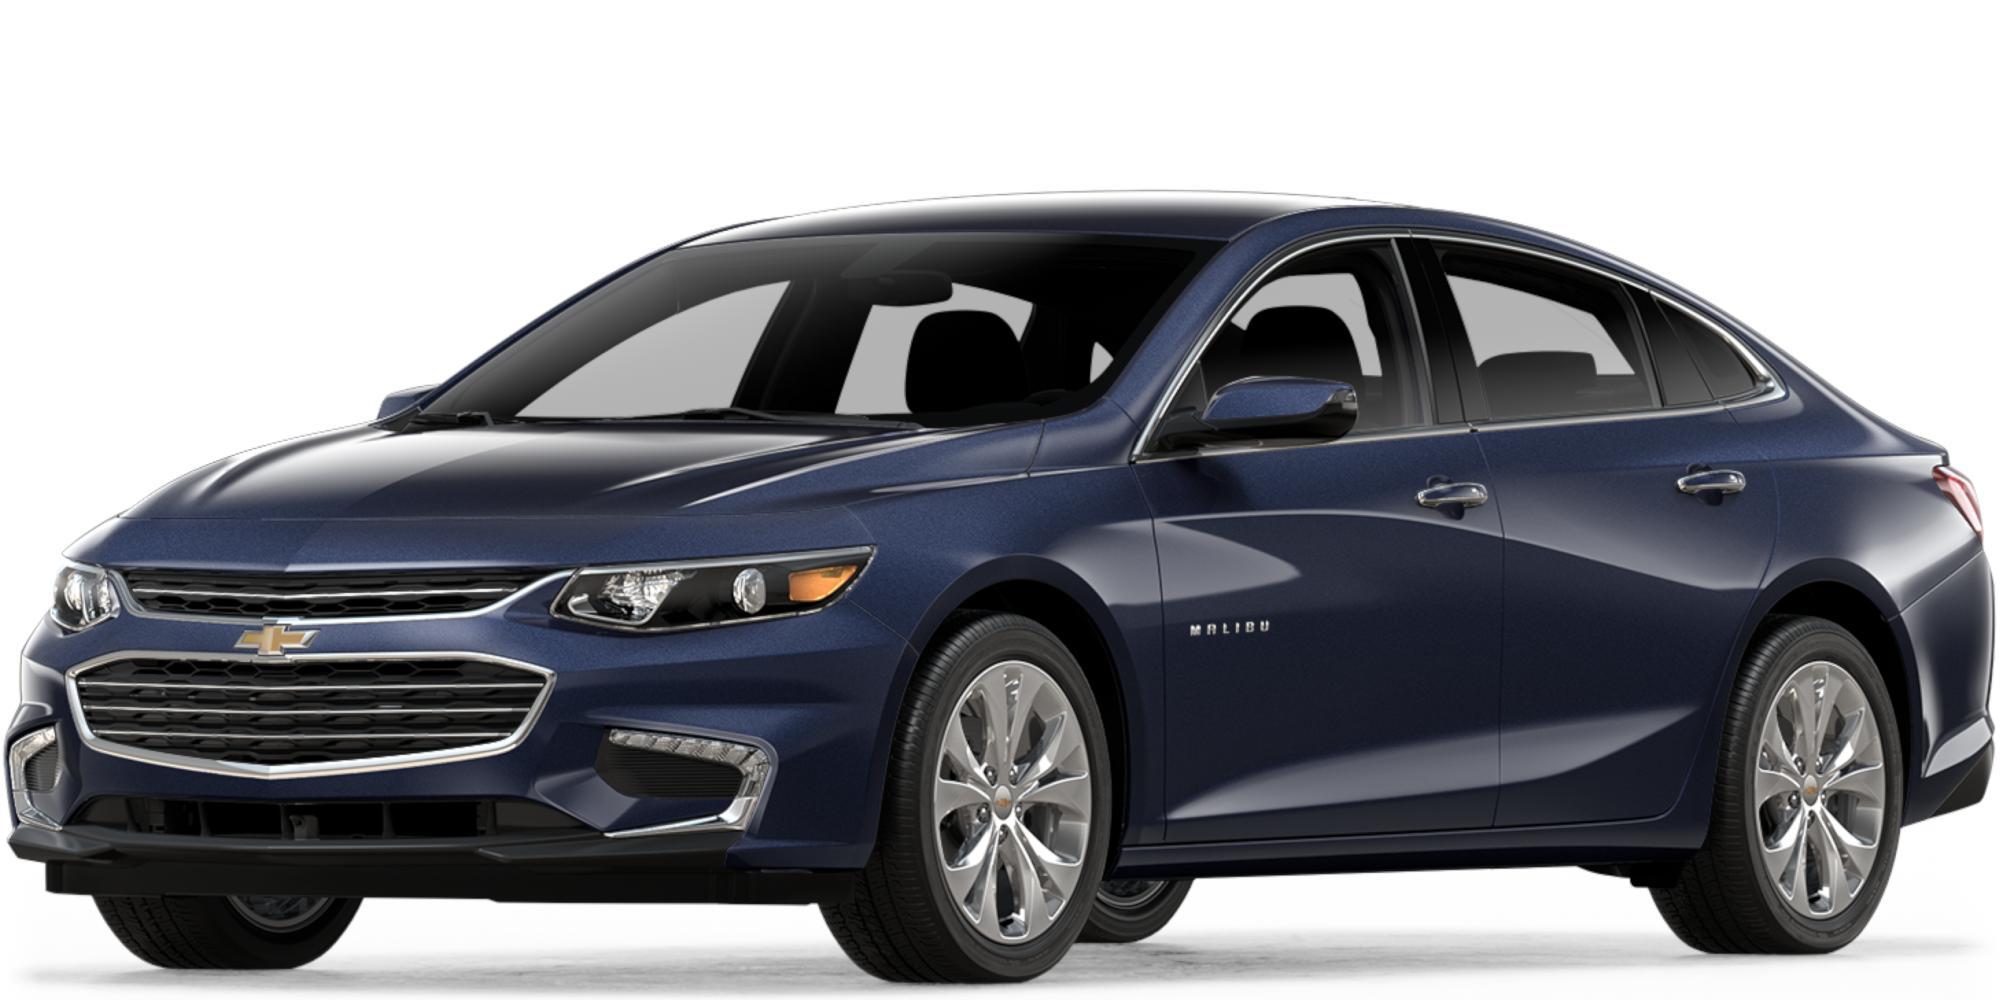 2018 Malibu Midsize Car Hybrid Chevrolet. As Shown 31020 2. Chevrolet. Chevy Malibu 2 4l Twin Cam Diagram At Scoala.co